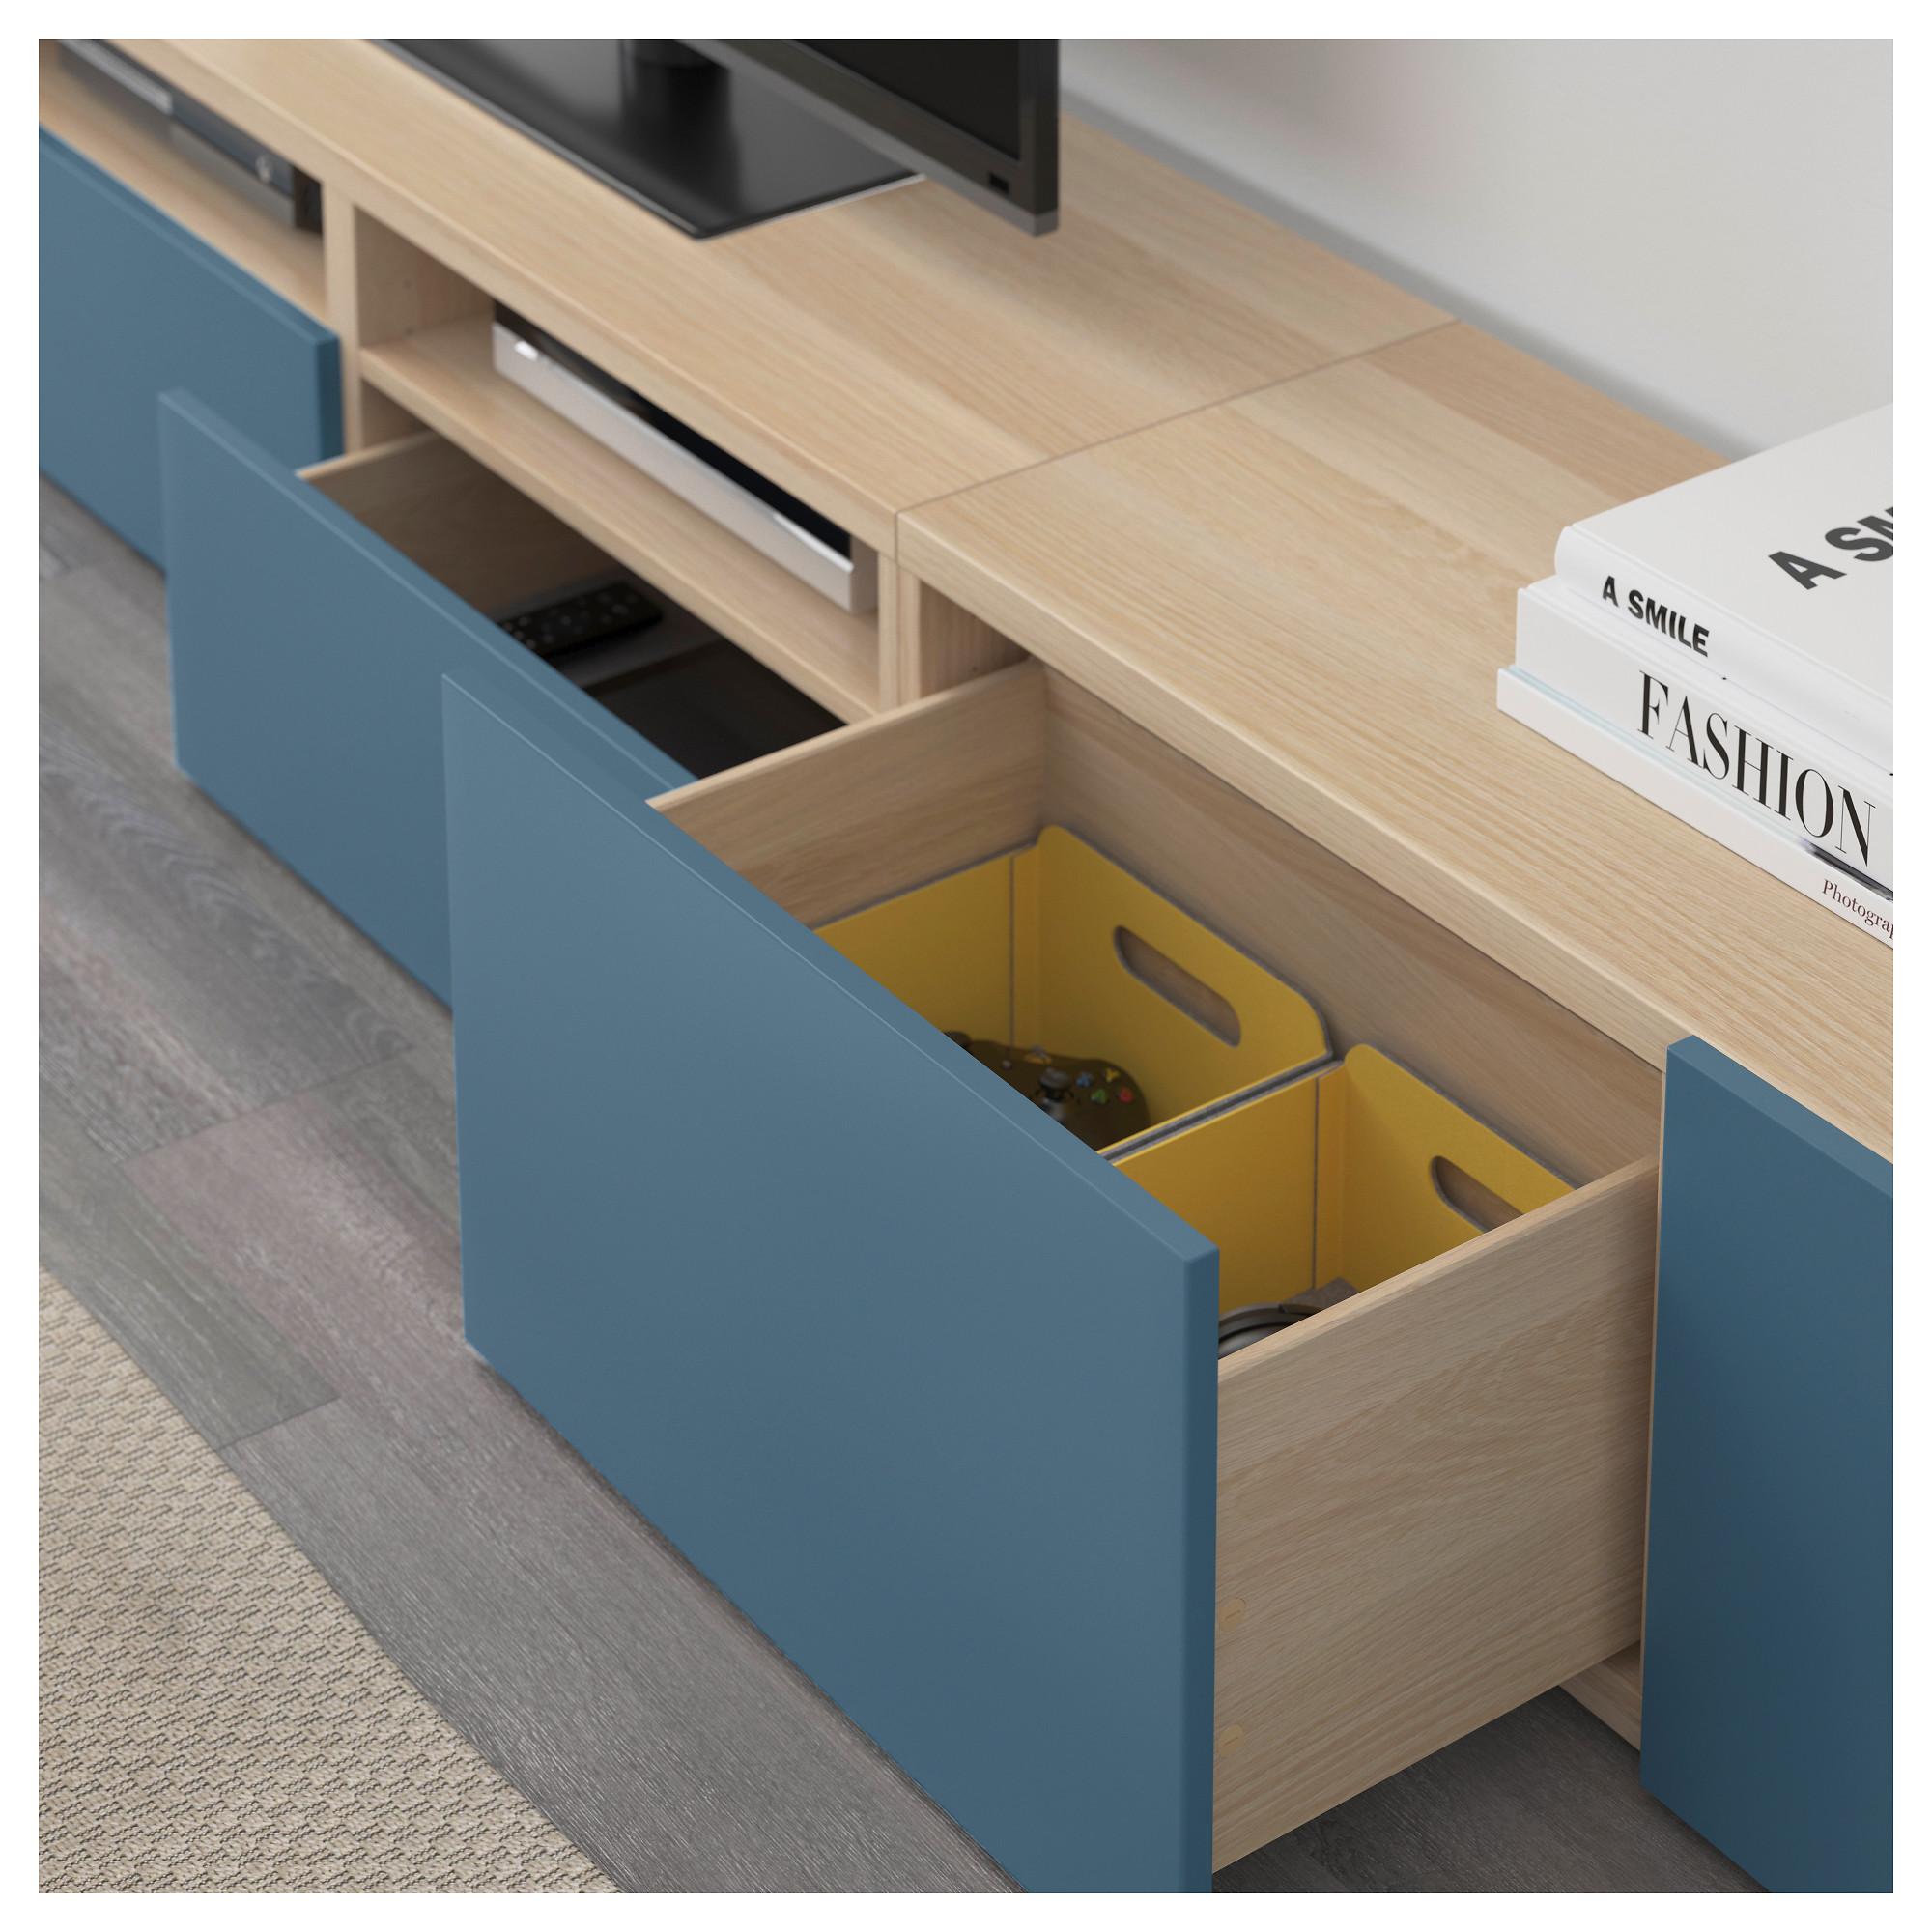 Шкаф для ТВ, комбинация БЕСТО темно-синий артикуль № 592.516.66 в наличии. Online каталог IKEA РБ. Быстрая доставка и соборка.